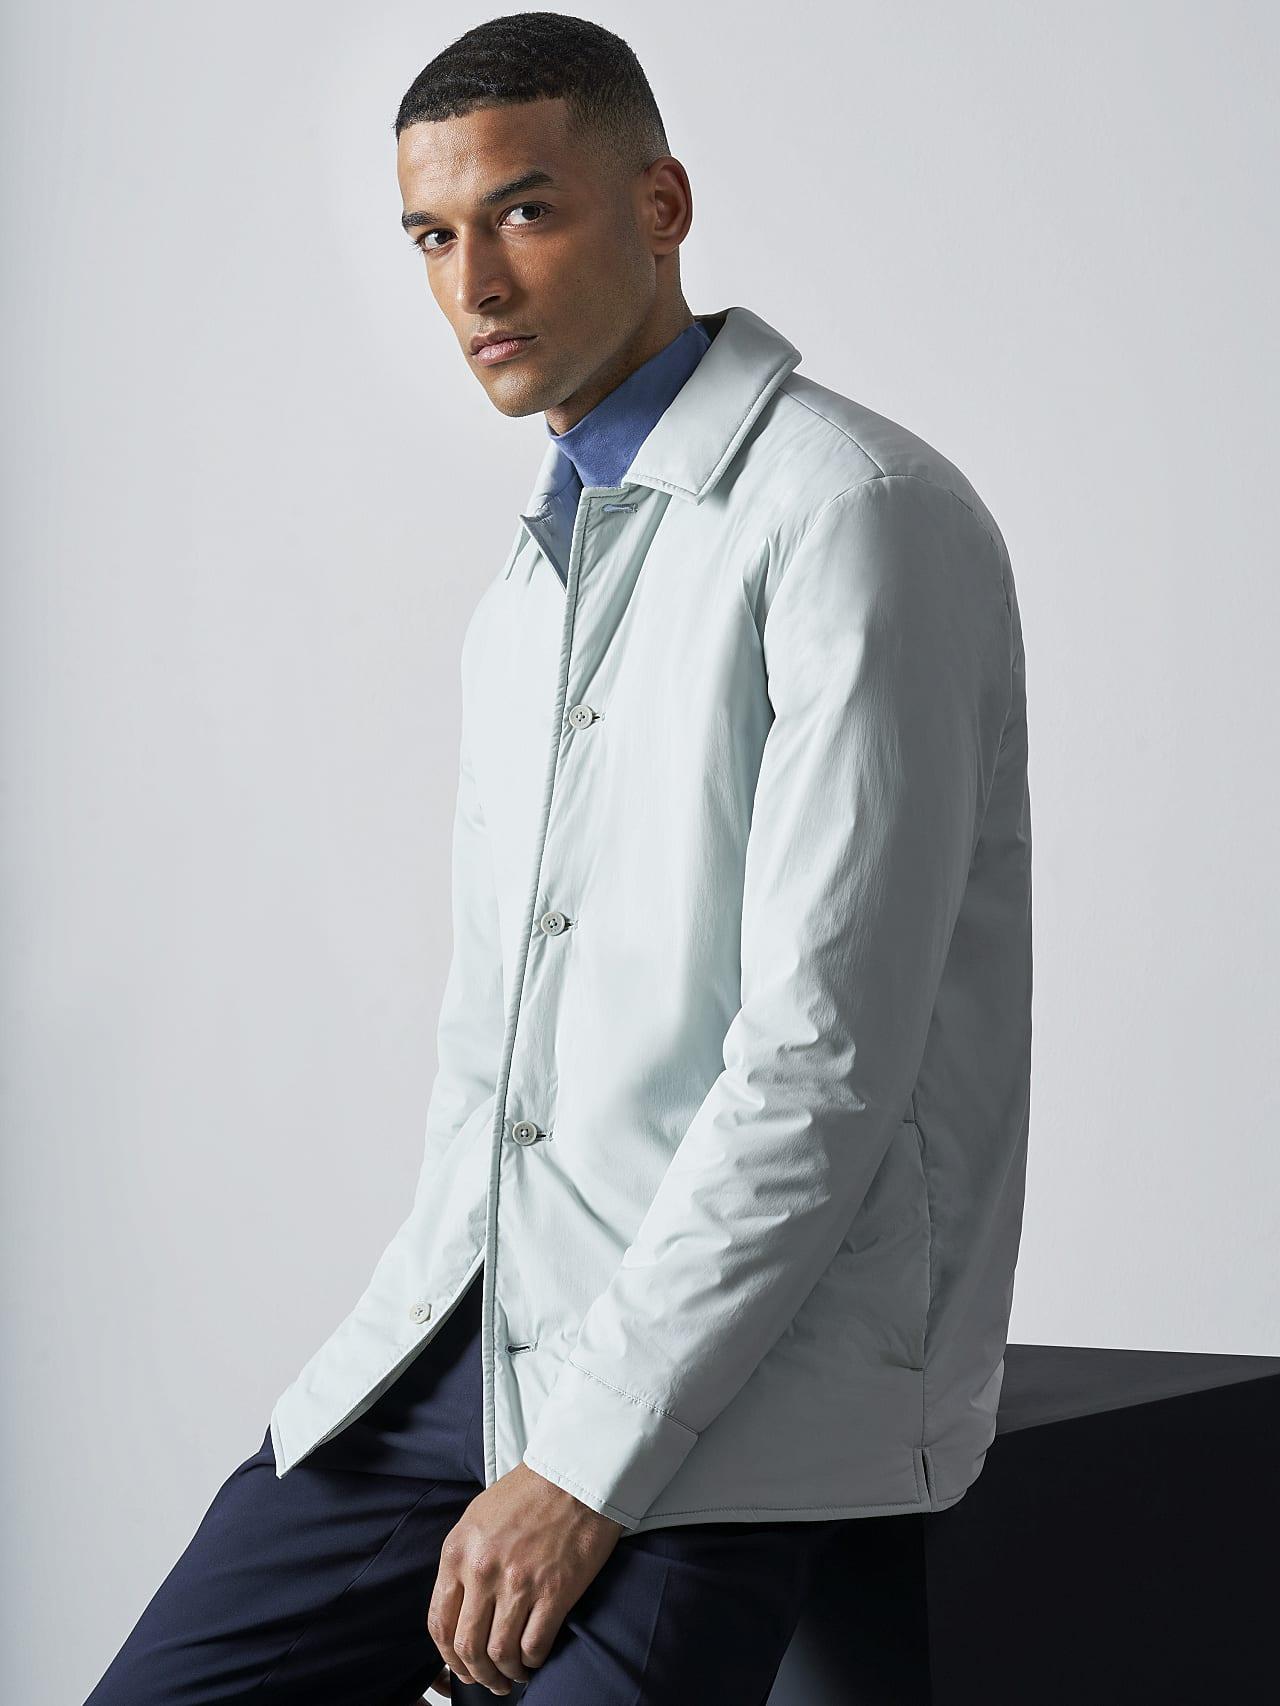 OVASU V1.Y5.02 PrimaLoft® Overshirt Jacket Pale Blue  Model shot Alpha Tauri